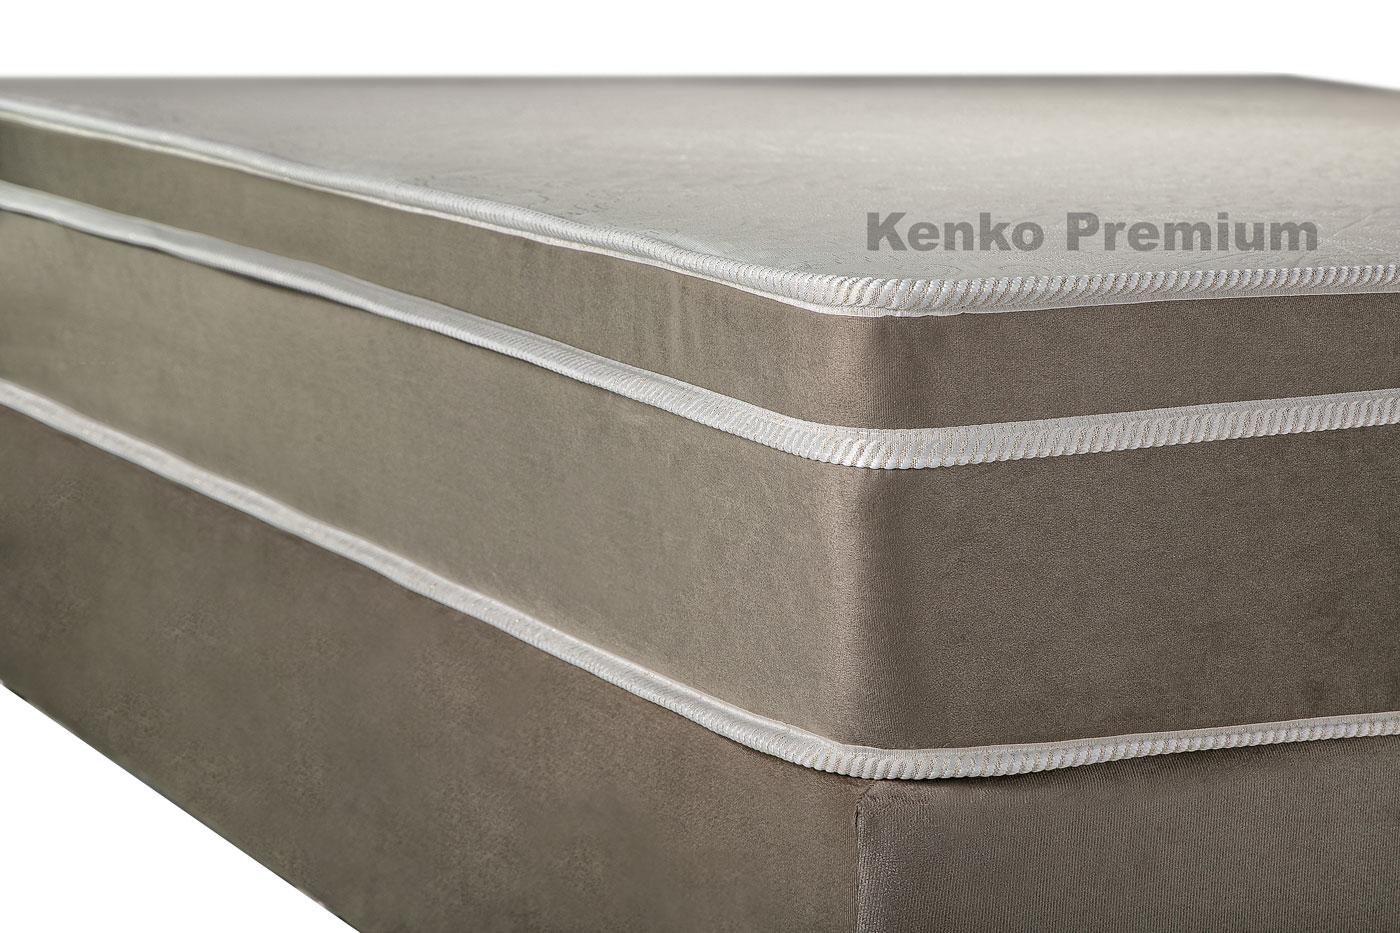 Colchão Magnético Kenko Premium, Modelo Standart Euro Pilow  - Kenko Premium Colchões